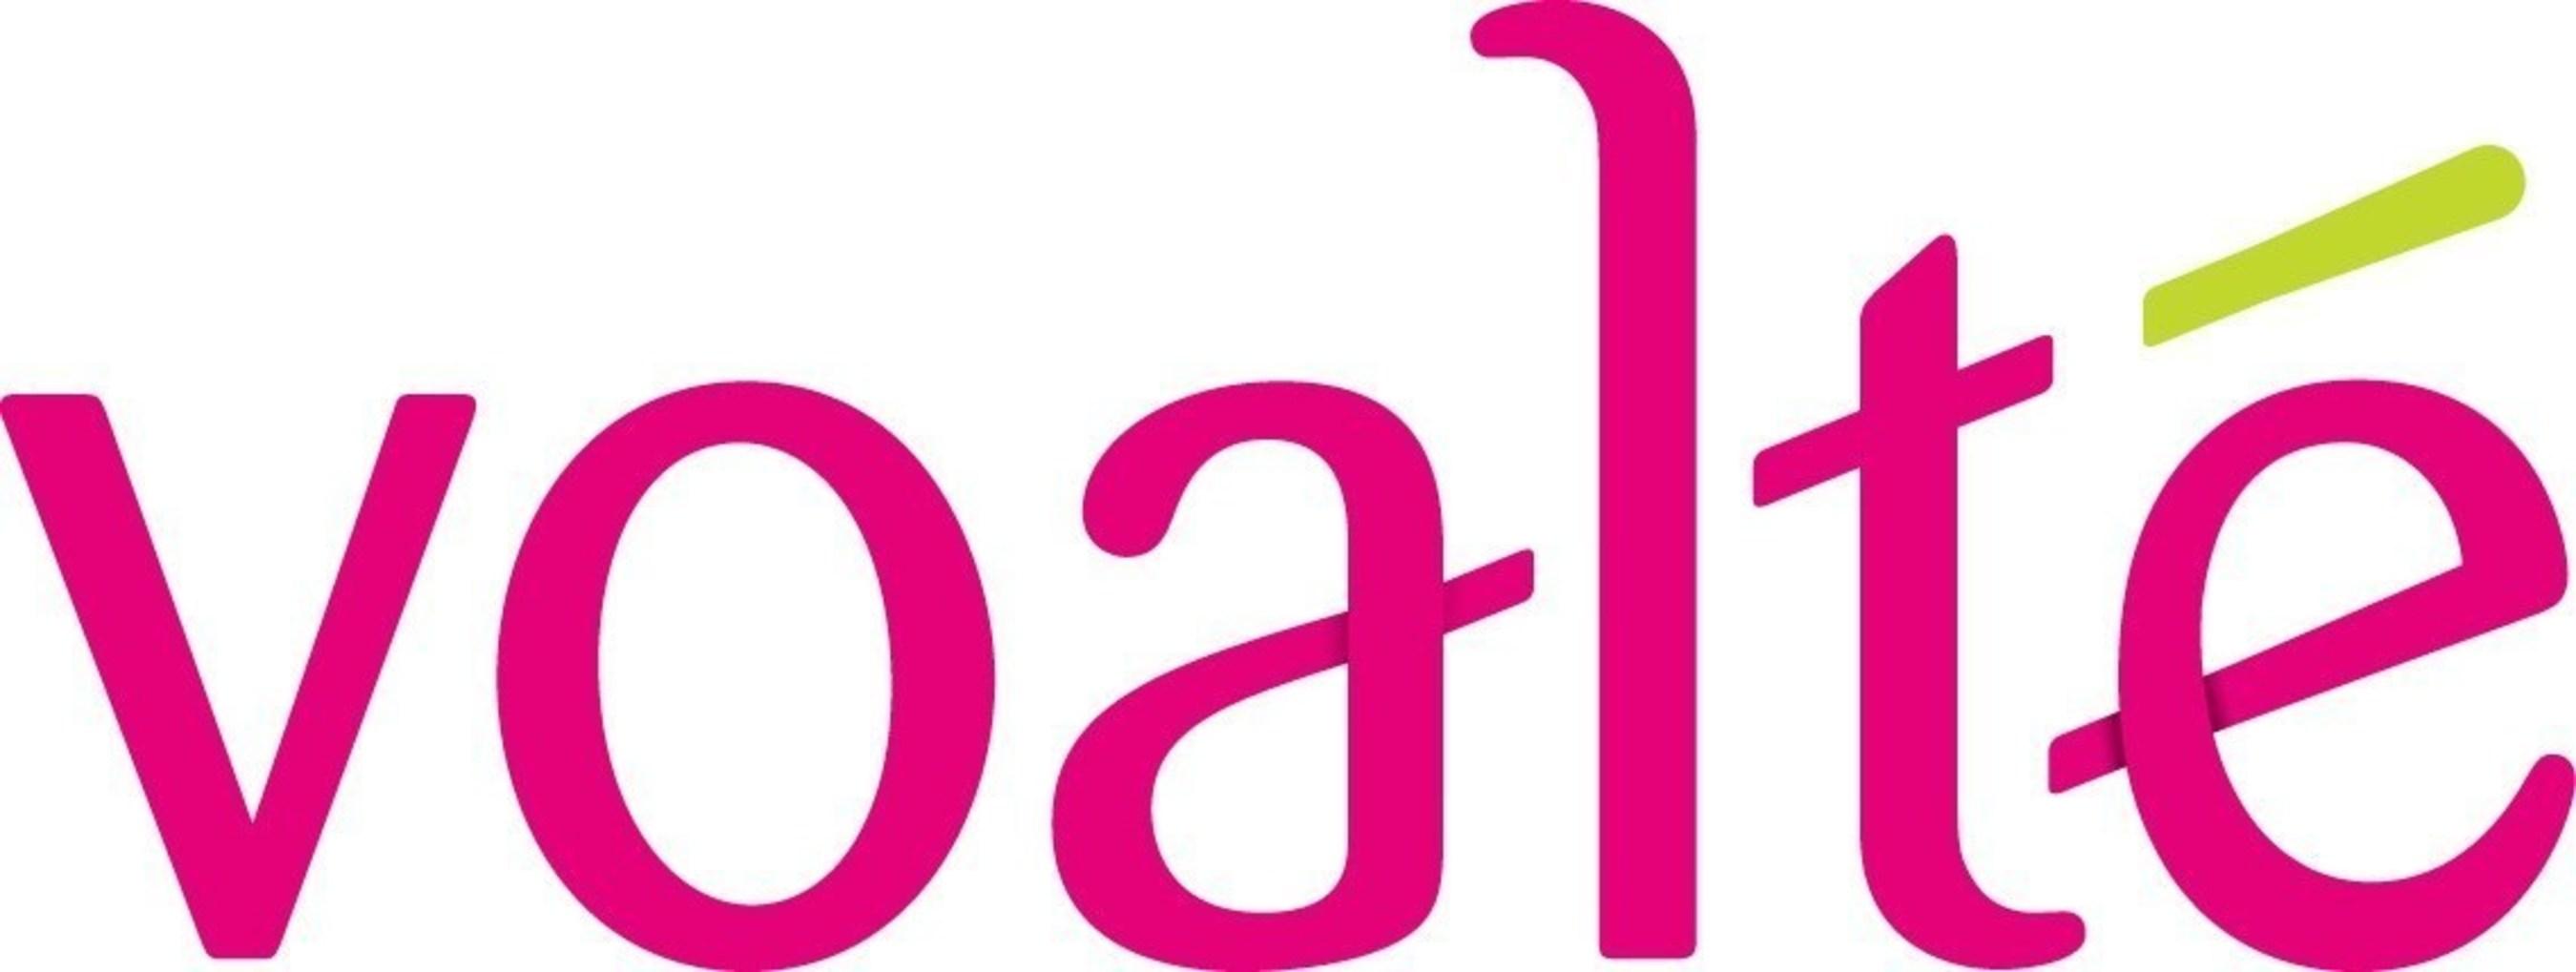 About Voalte: Voalte develops smartphone alternatives that simplify caregiver communication. Voalte enables ...